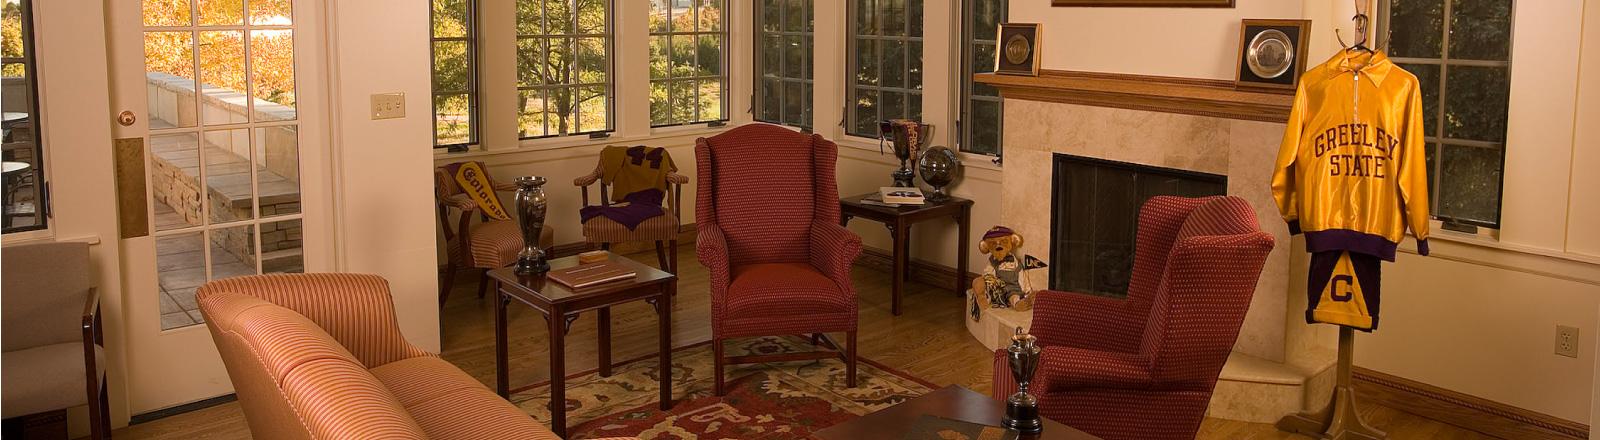 Judy Farr Heritage Room